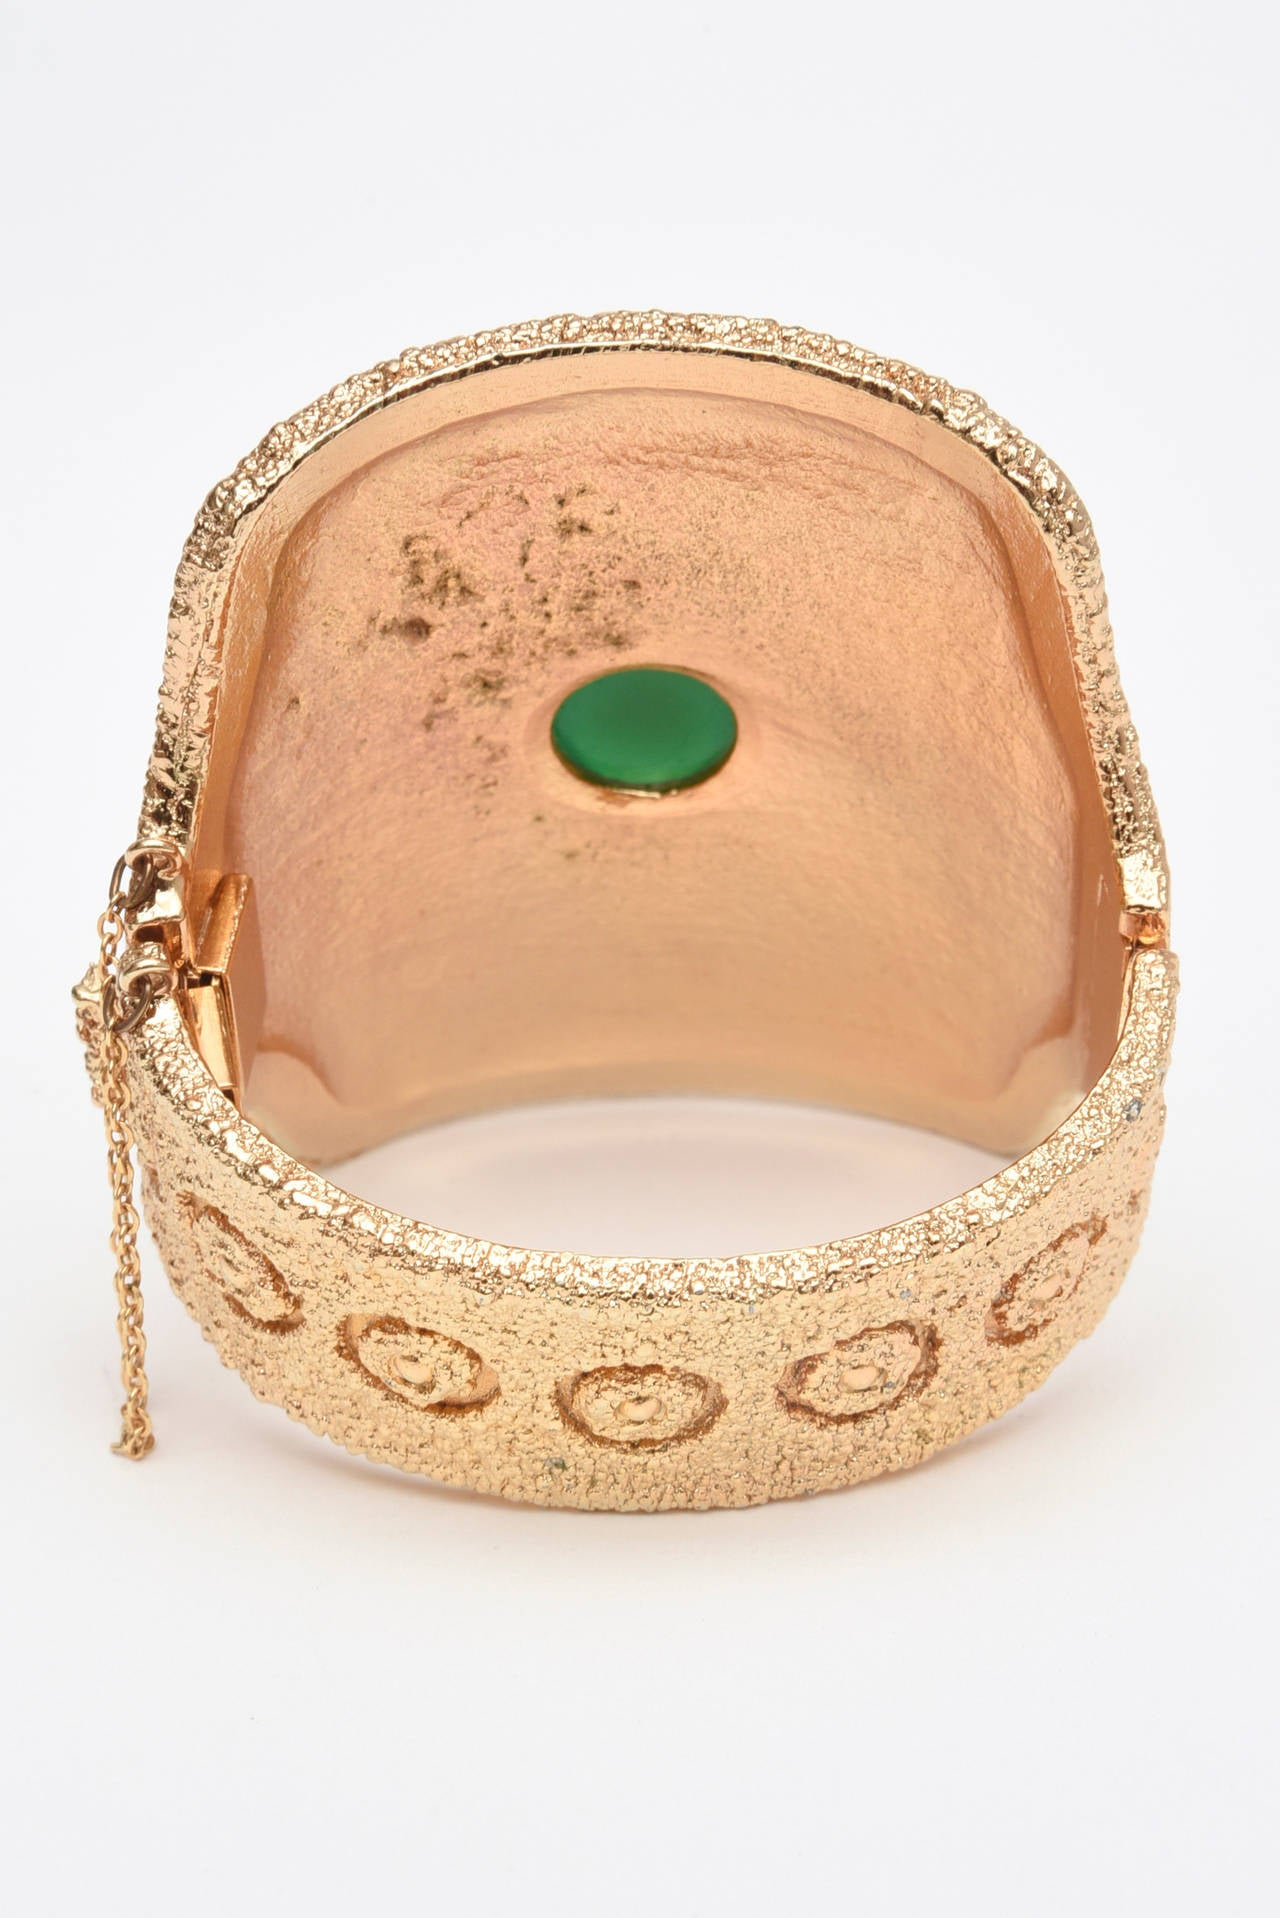 Vintage Napier Textural Gold Plated Green Glass Cuff Bracelet 4